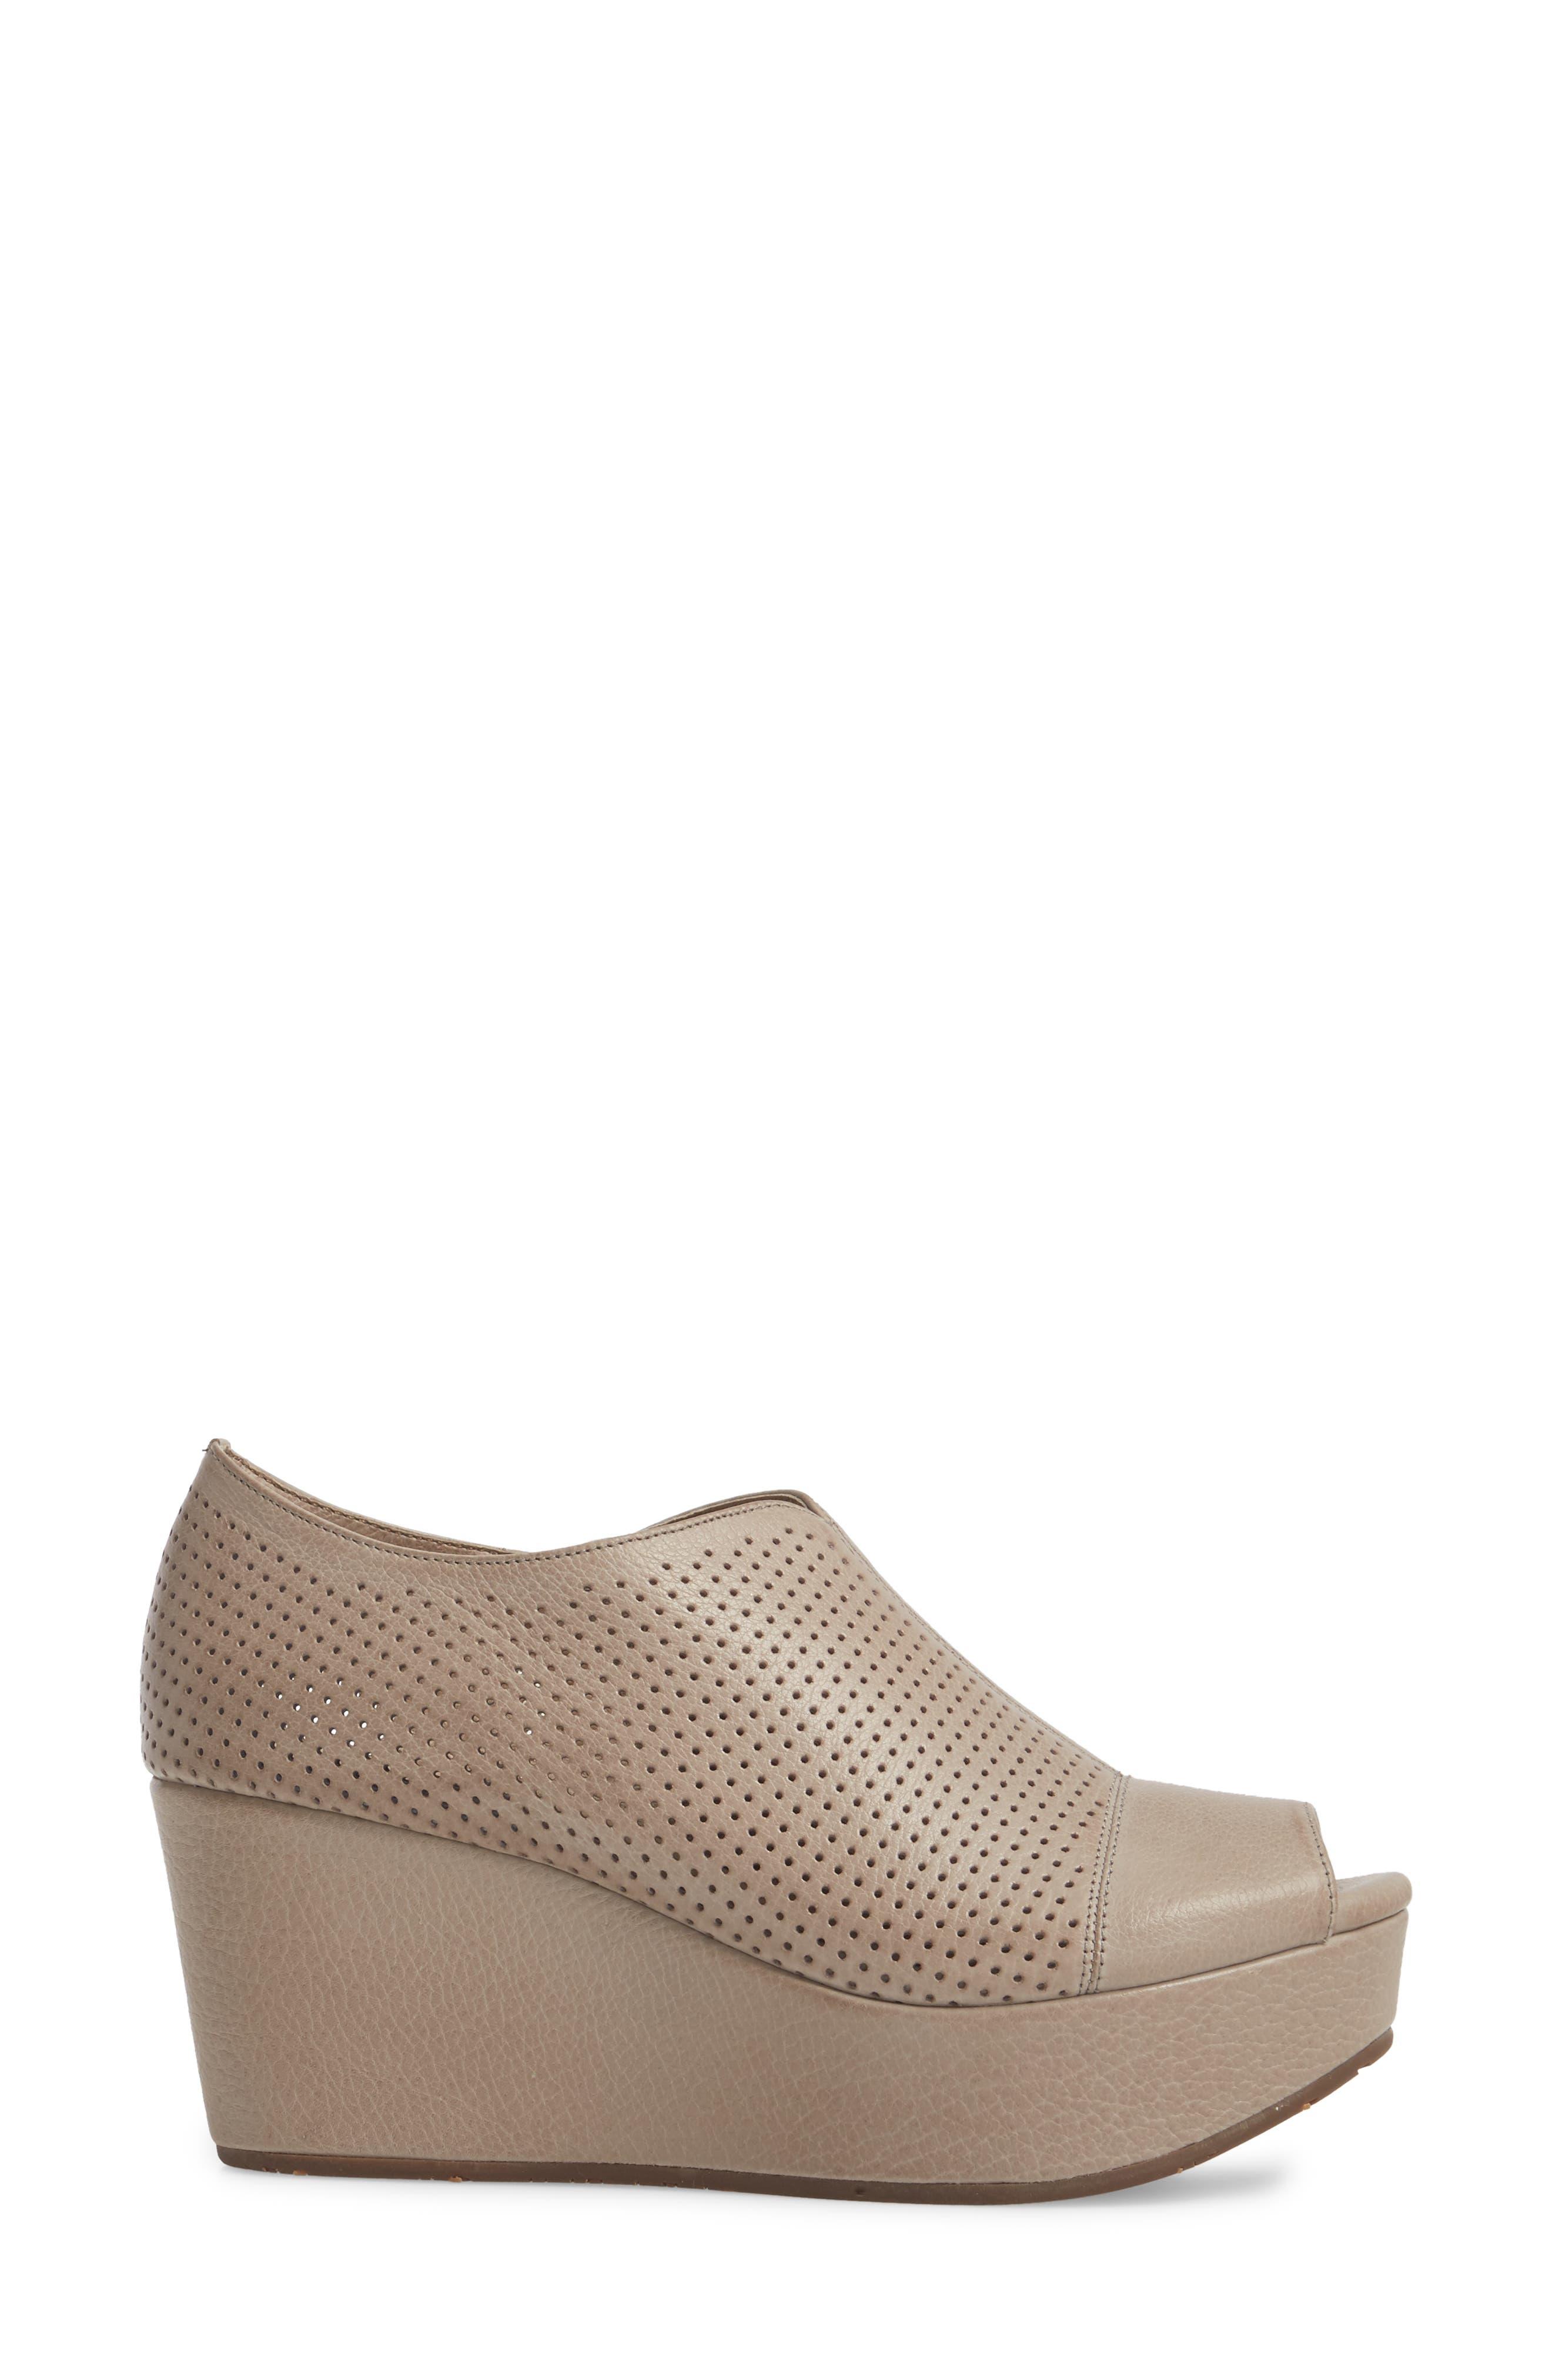 Wheeler Wedge Sandal,                             Alternate thumbnail 3, color,                             Grey Leather